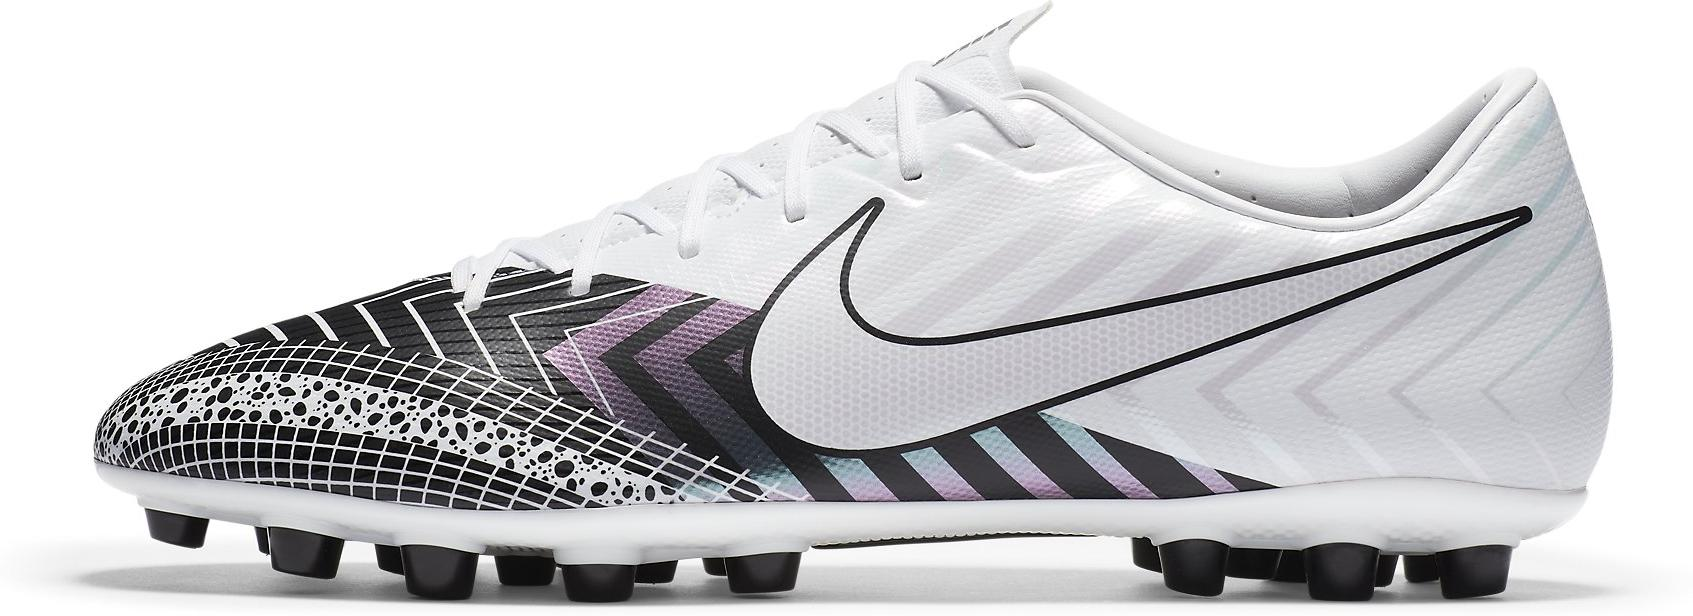 Kopačky Nike VAPOR 13 ACADEMY MDS AG bílá